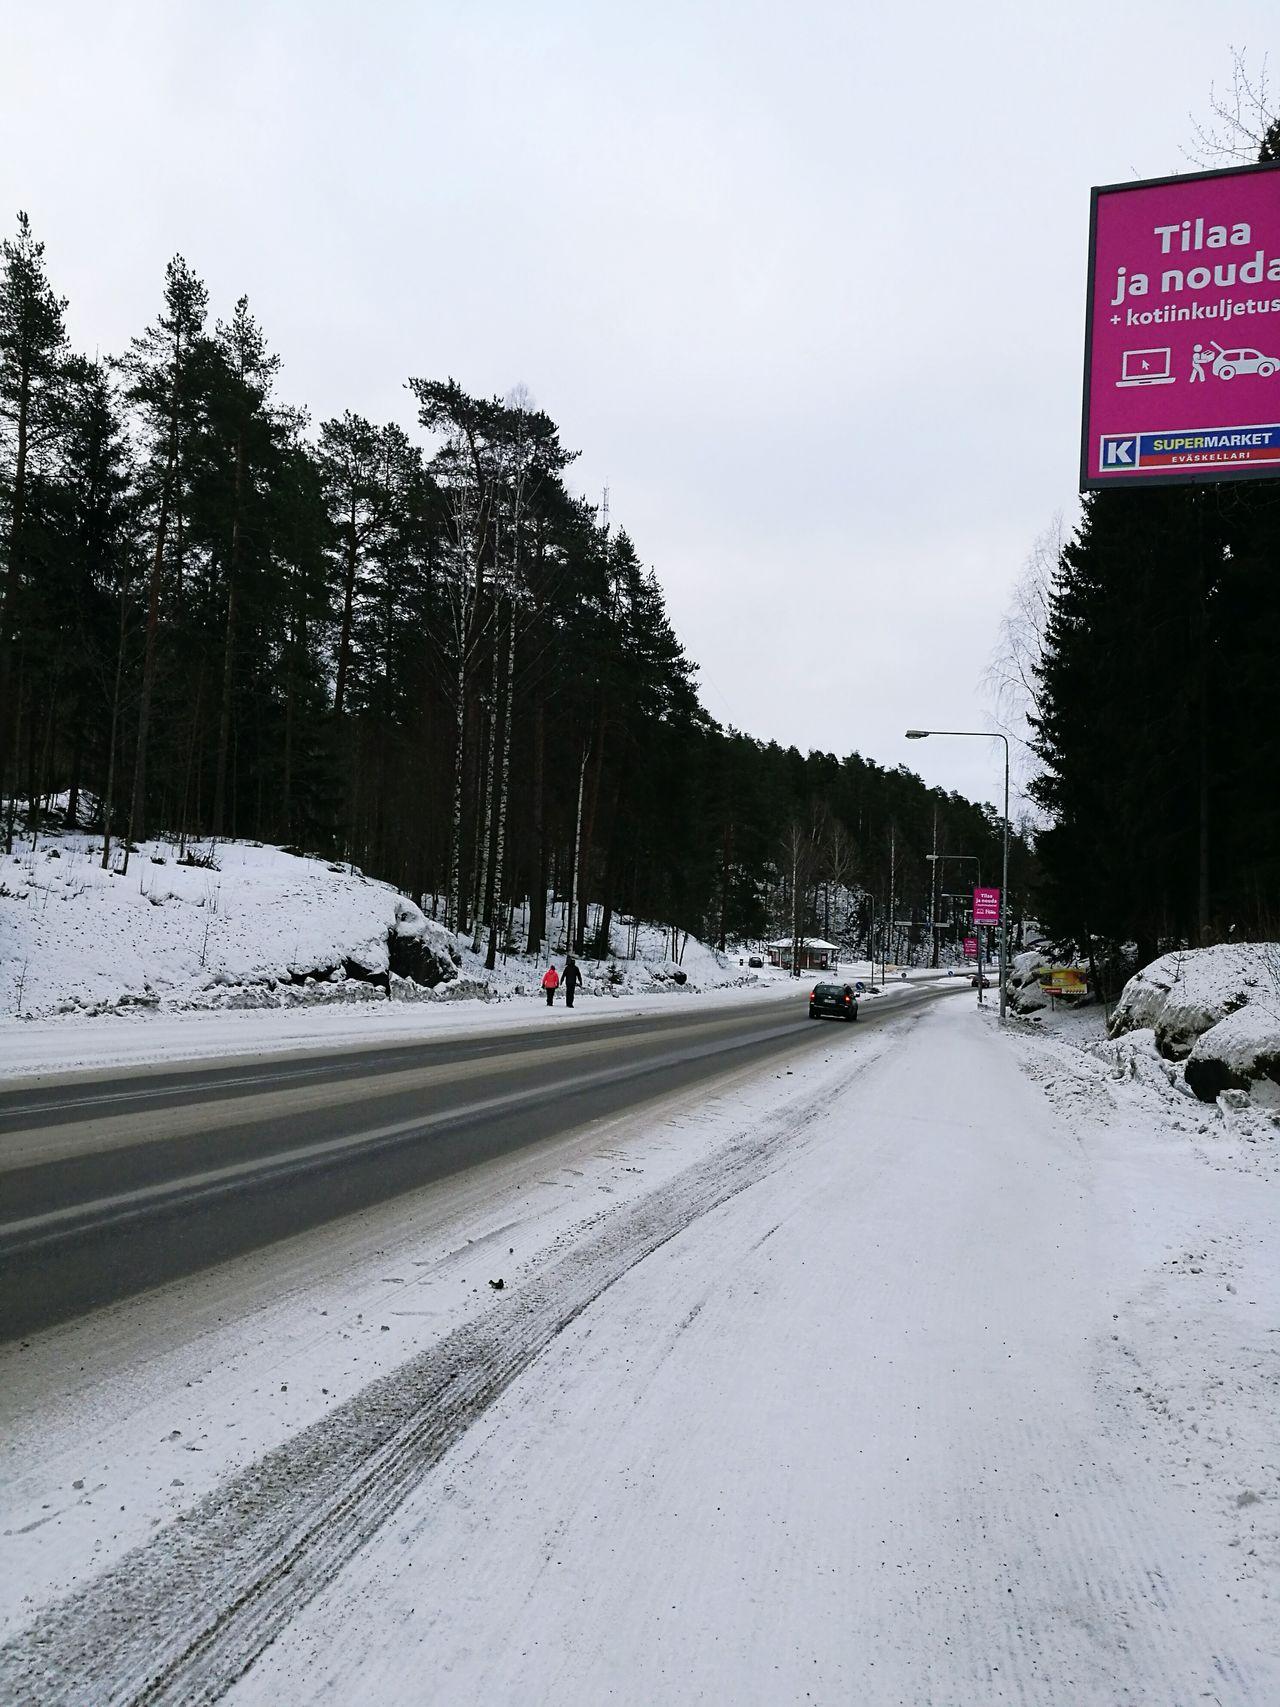 Finland Savonlinna Finland Finland Cloud - Sky Winter Finland_photolovers Snowing Finlande Finland Savonlinna Finland♥ Finlandlovers FinlandsWinter